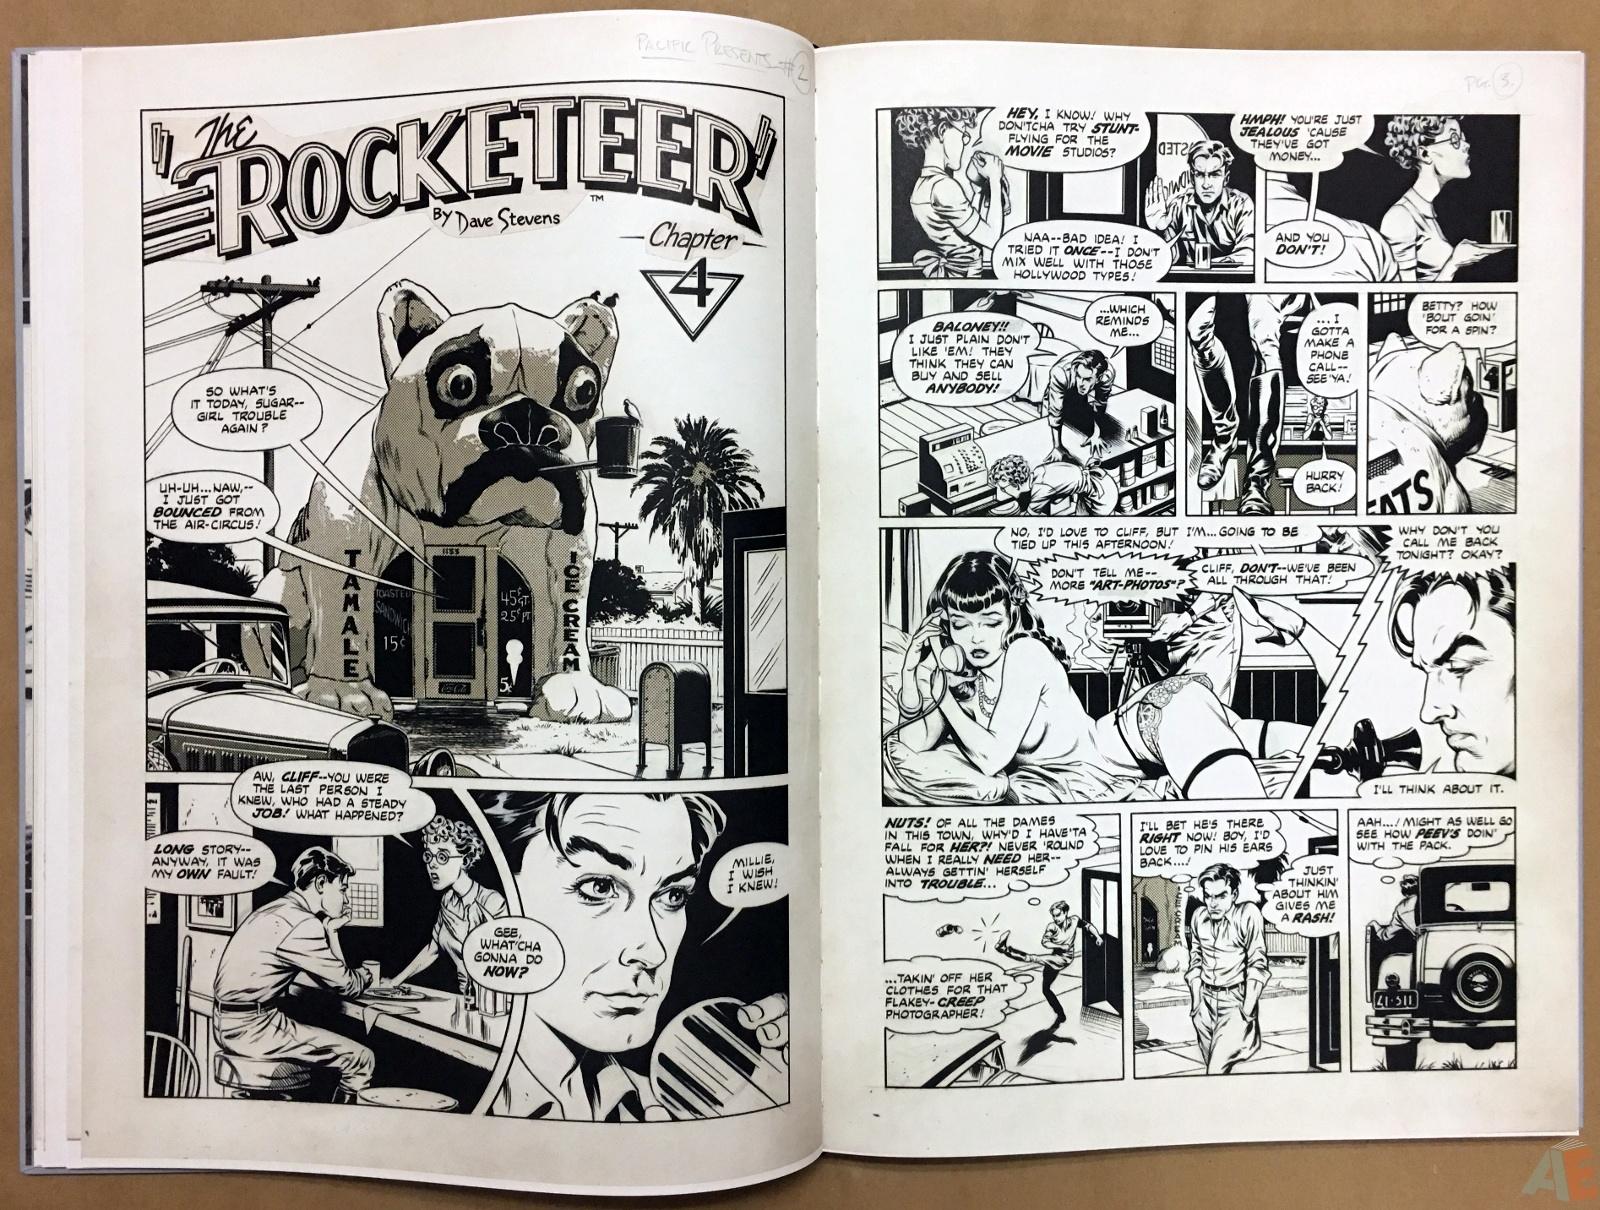 Dave Stevens' The Rocketeer Artist's Edition